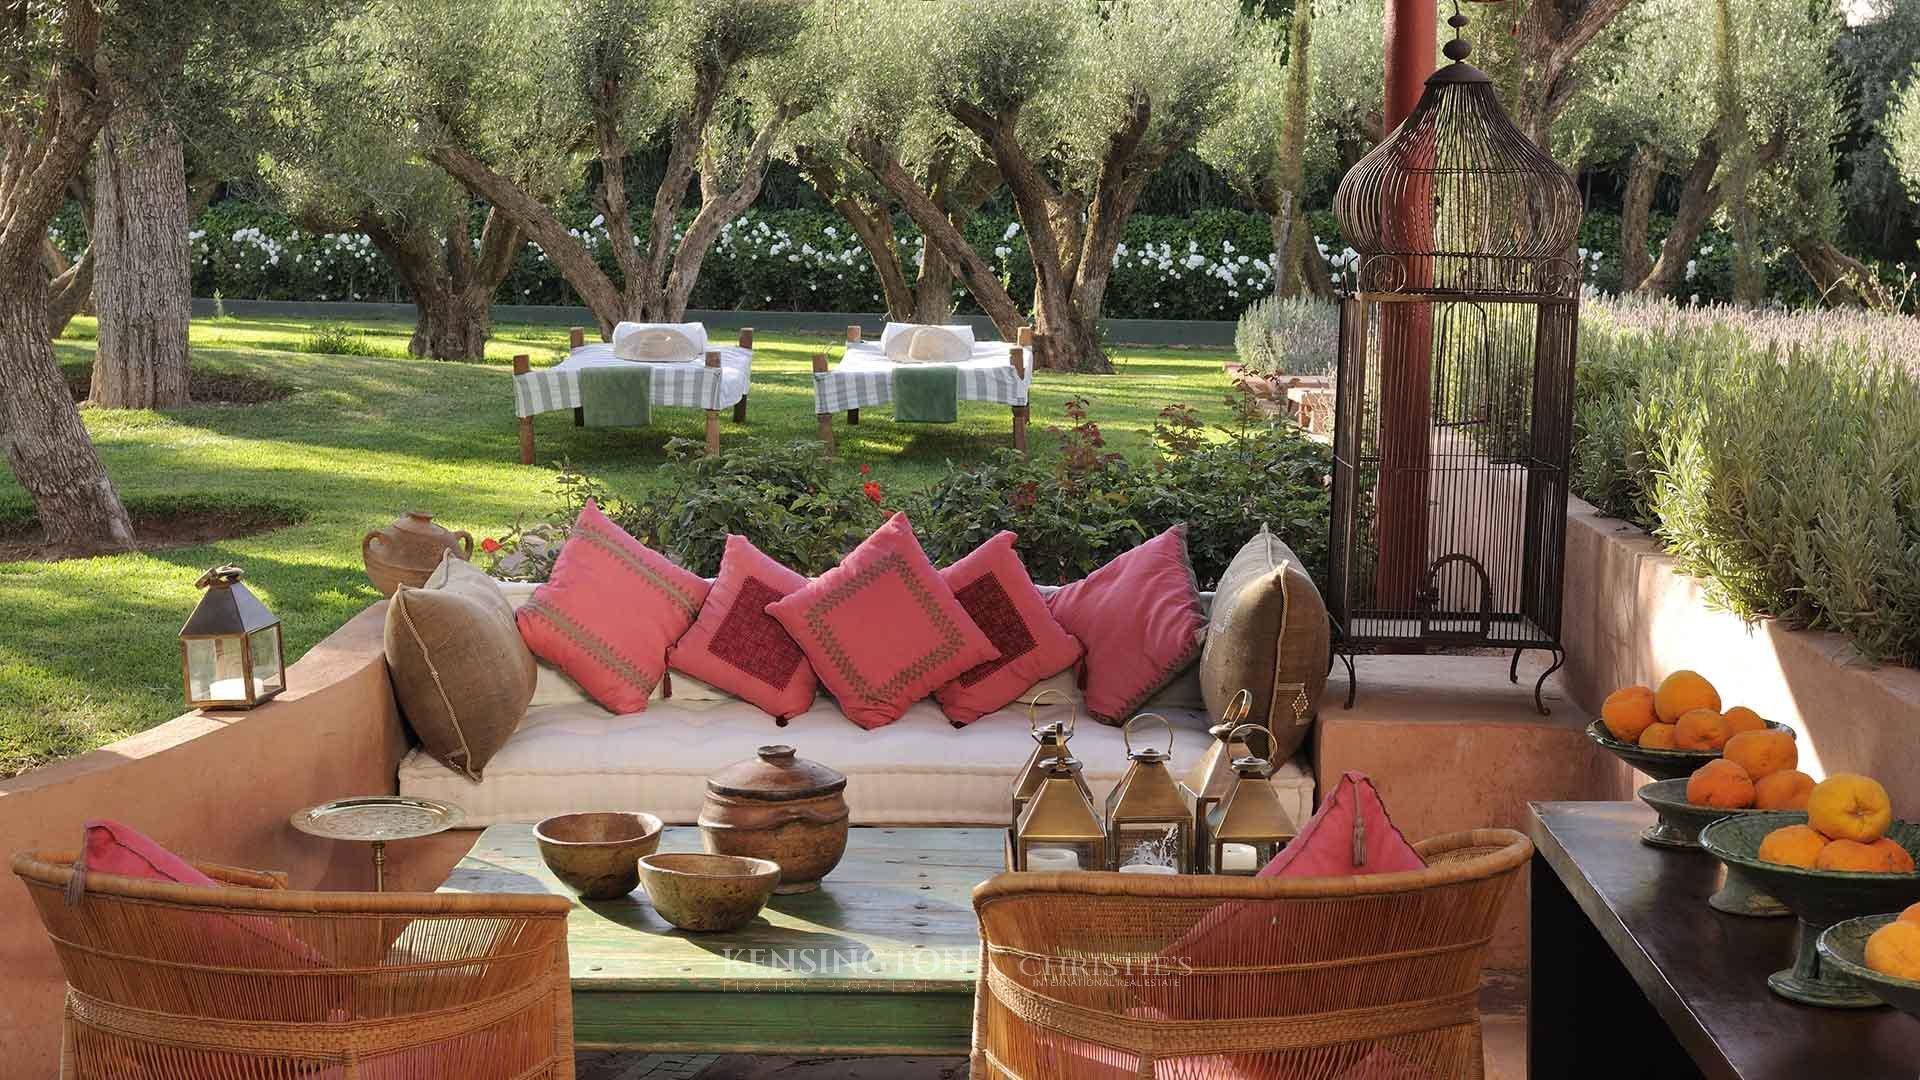 KPPM01008: Villa Alkhoz Luxury Villa Marrakech Morocco